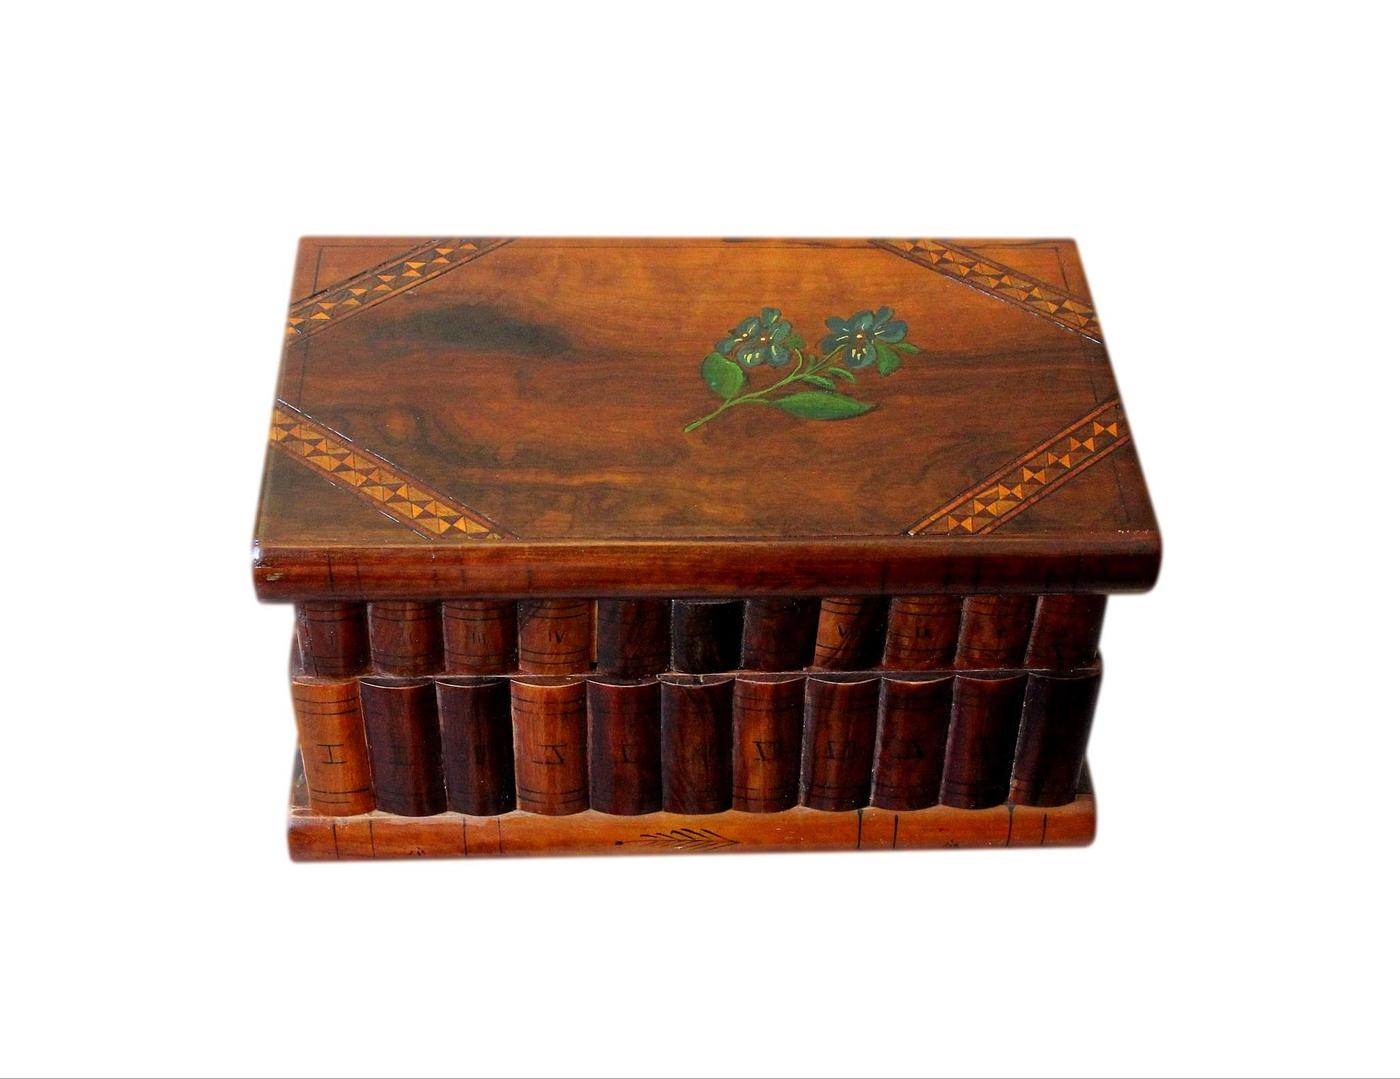 Italian Art Deco Puzzle Jewellery Box With Secret Lock And Compartment